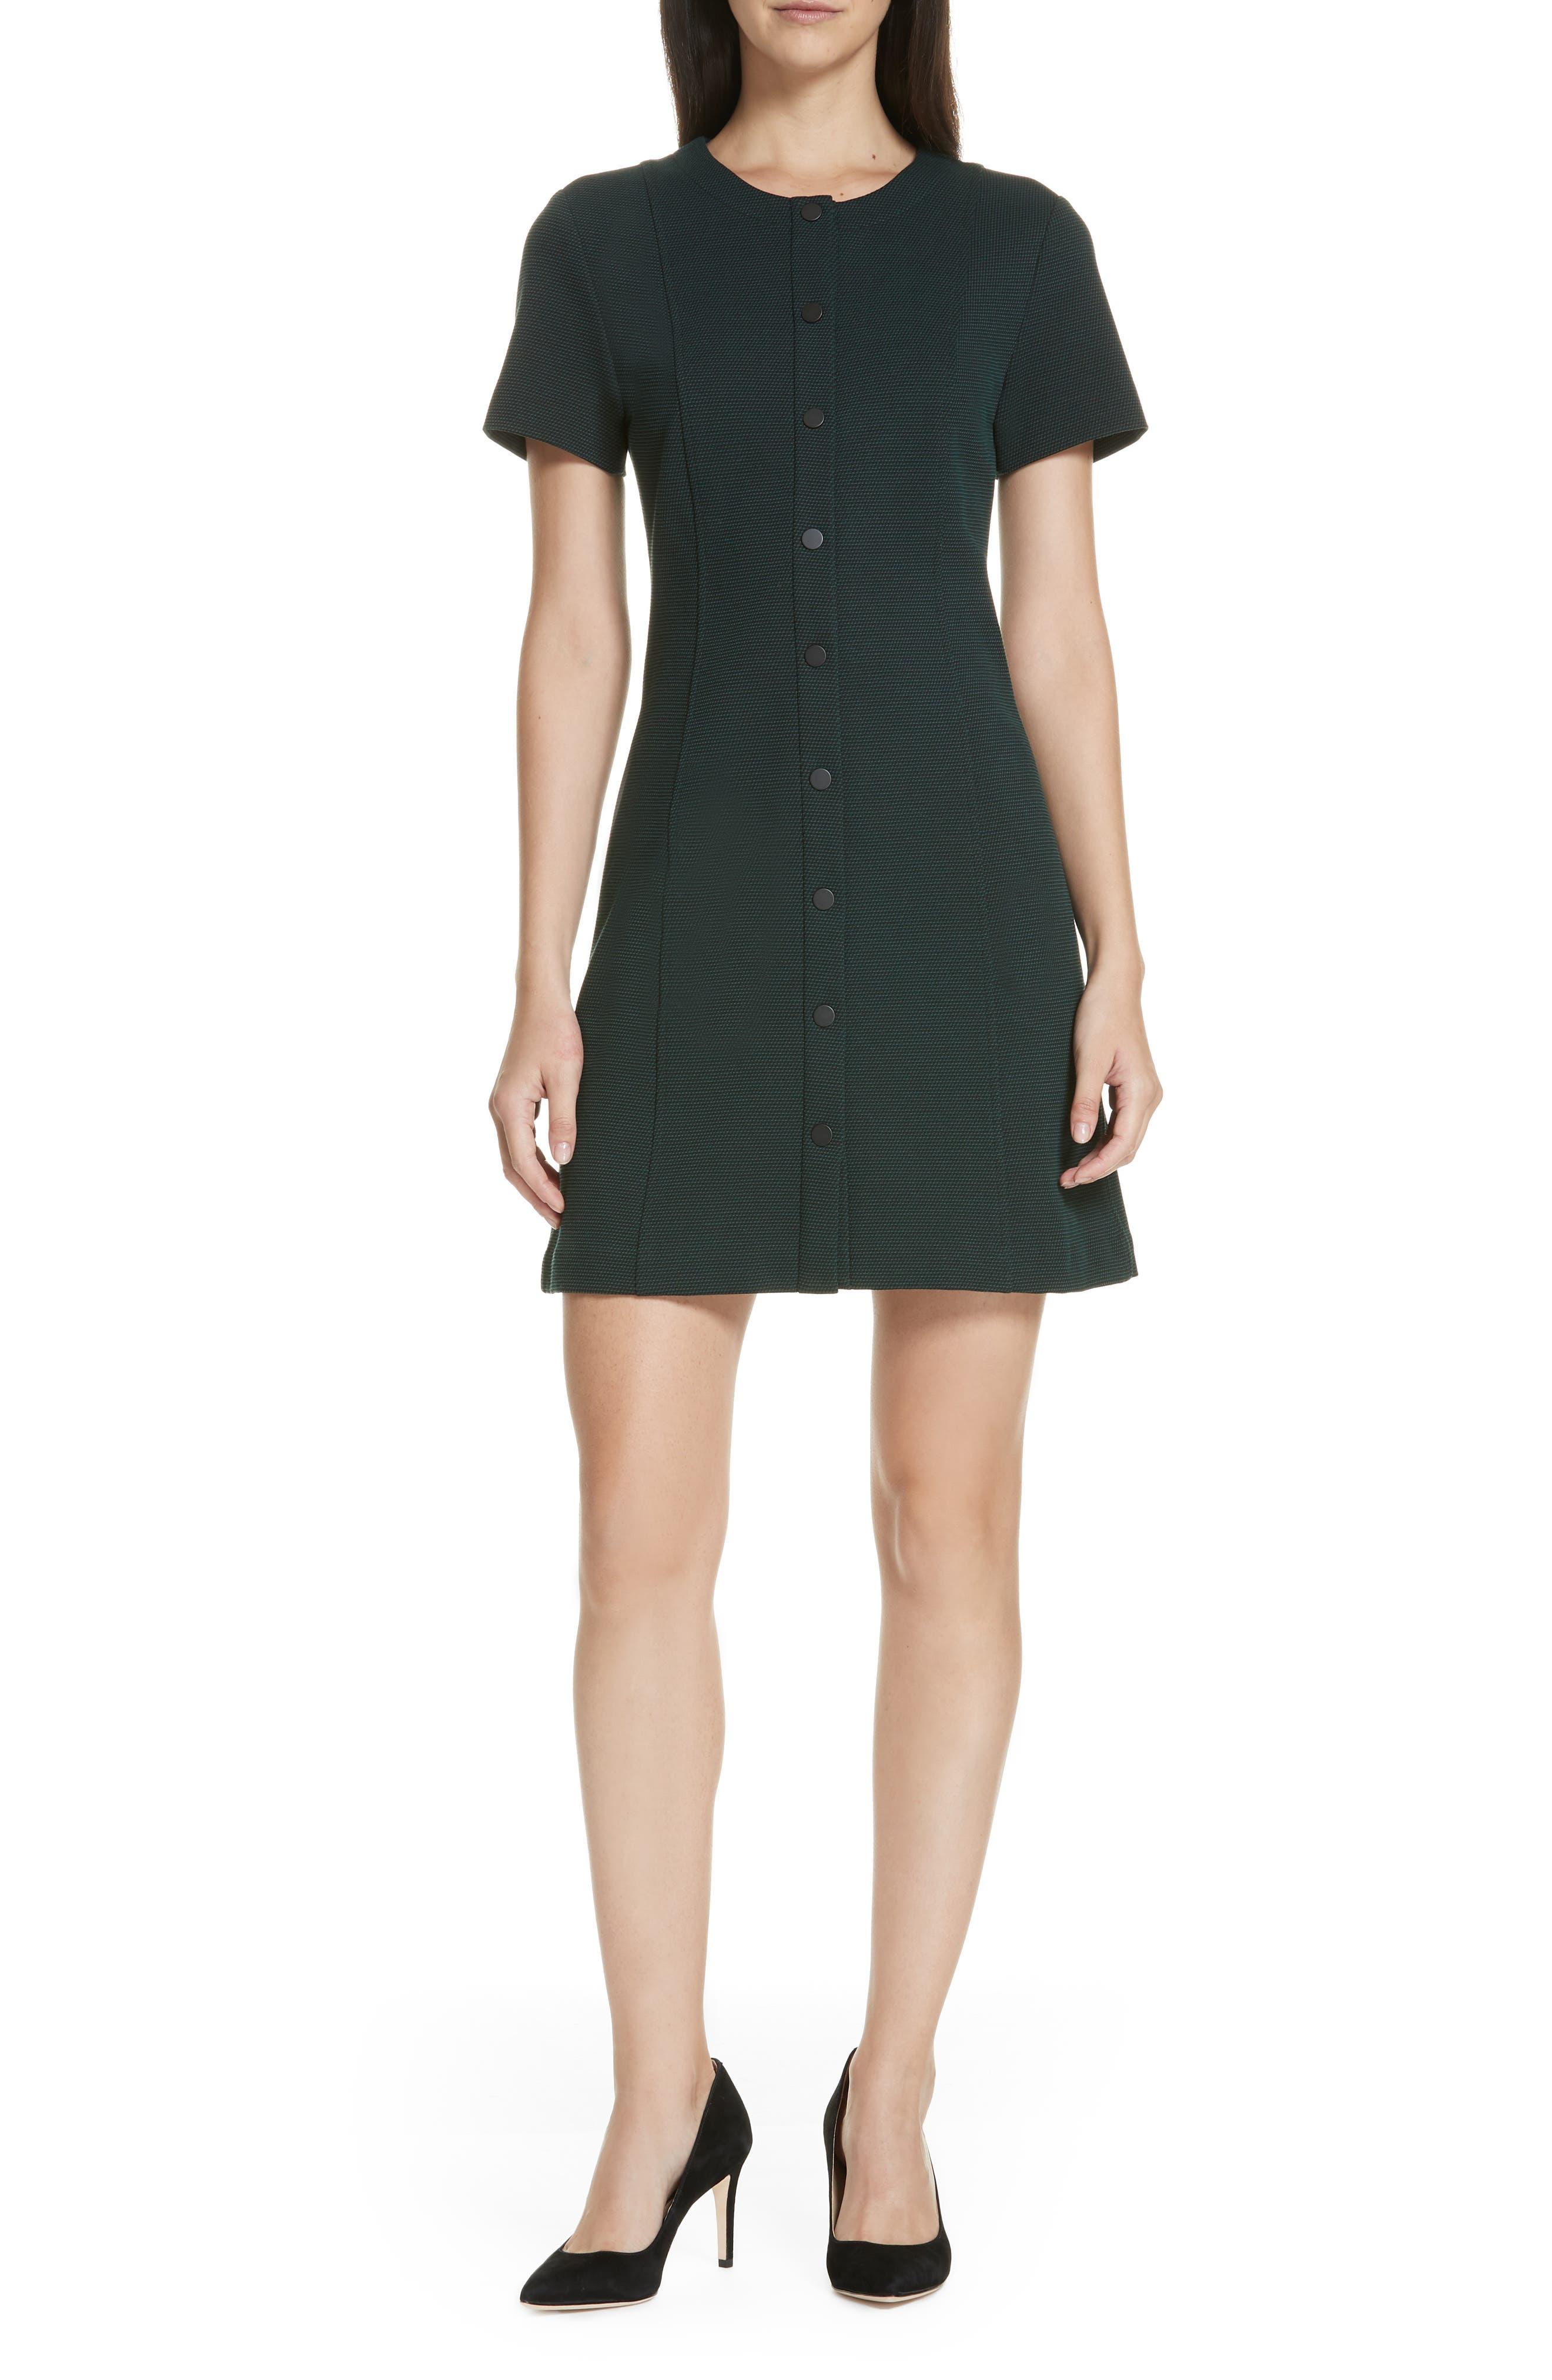 Easy Snap Textured Dress,                             Main thumbnail 1, color,                             GREEN POPLAR/ POP NAVY